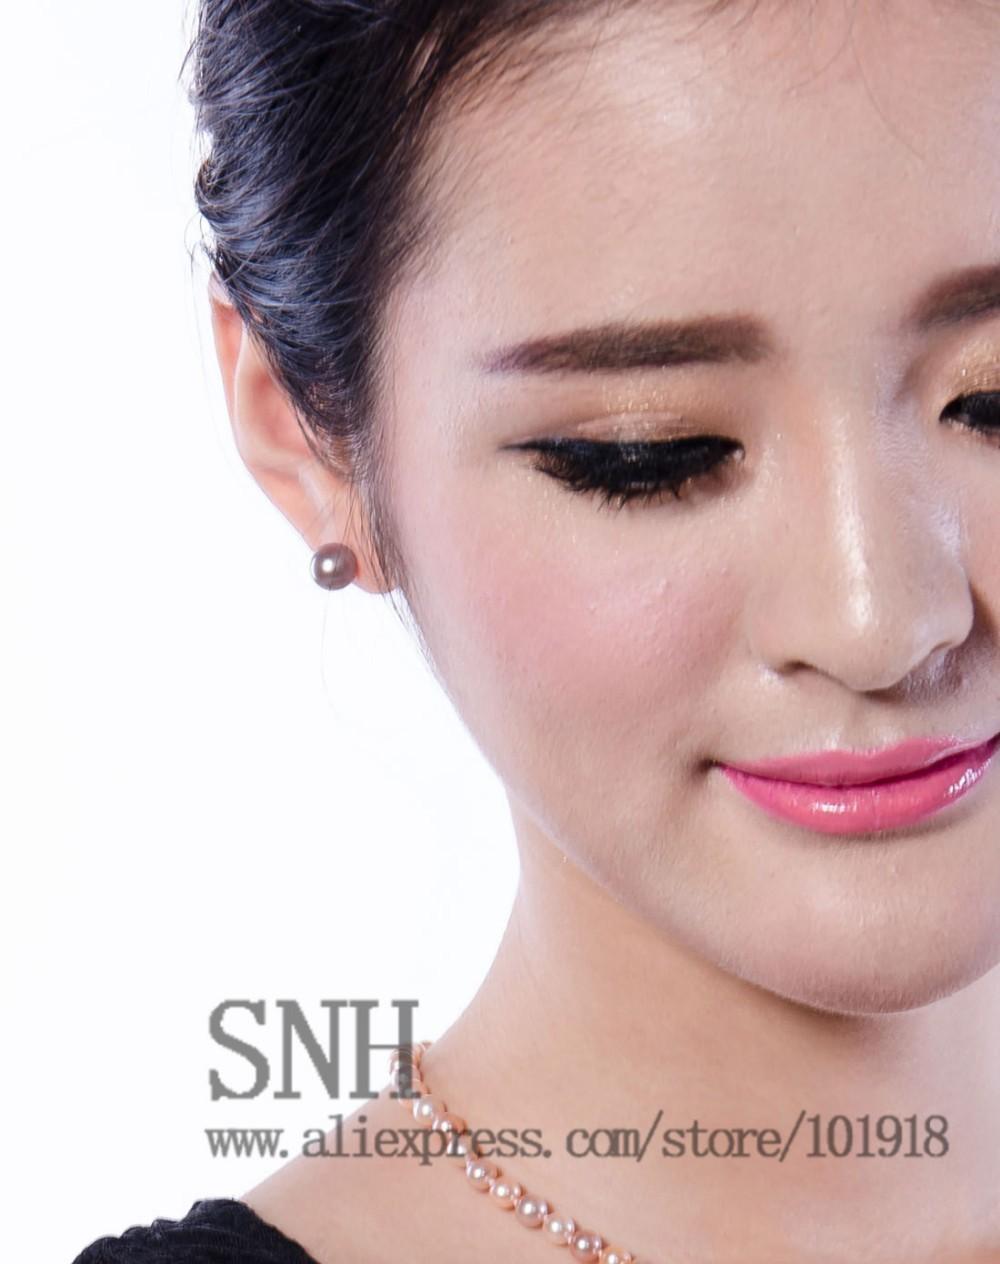 SNH-SNH2014161-4